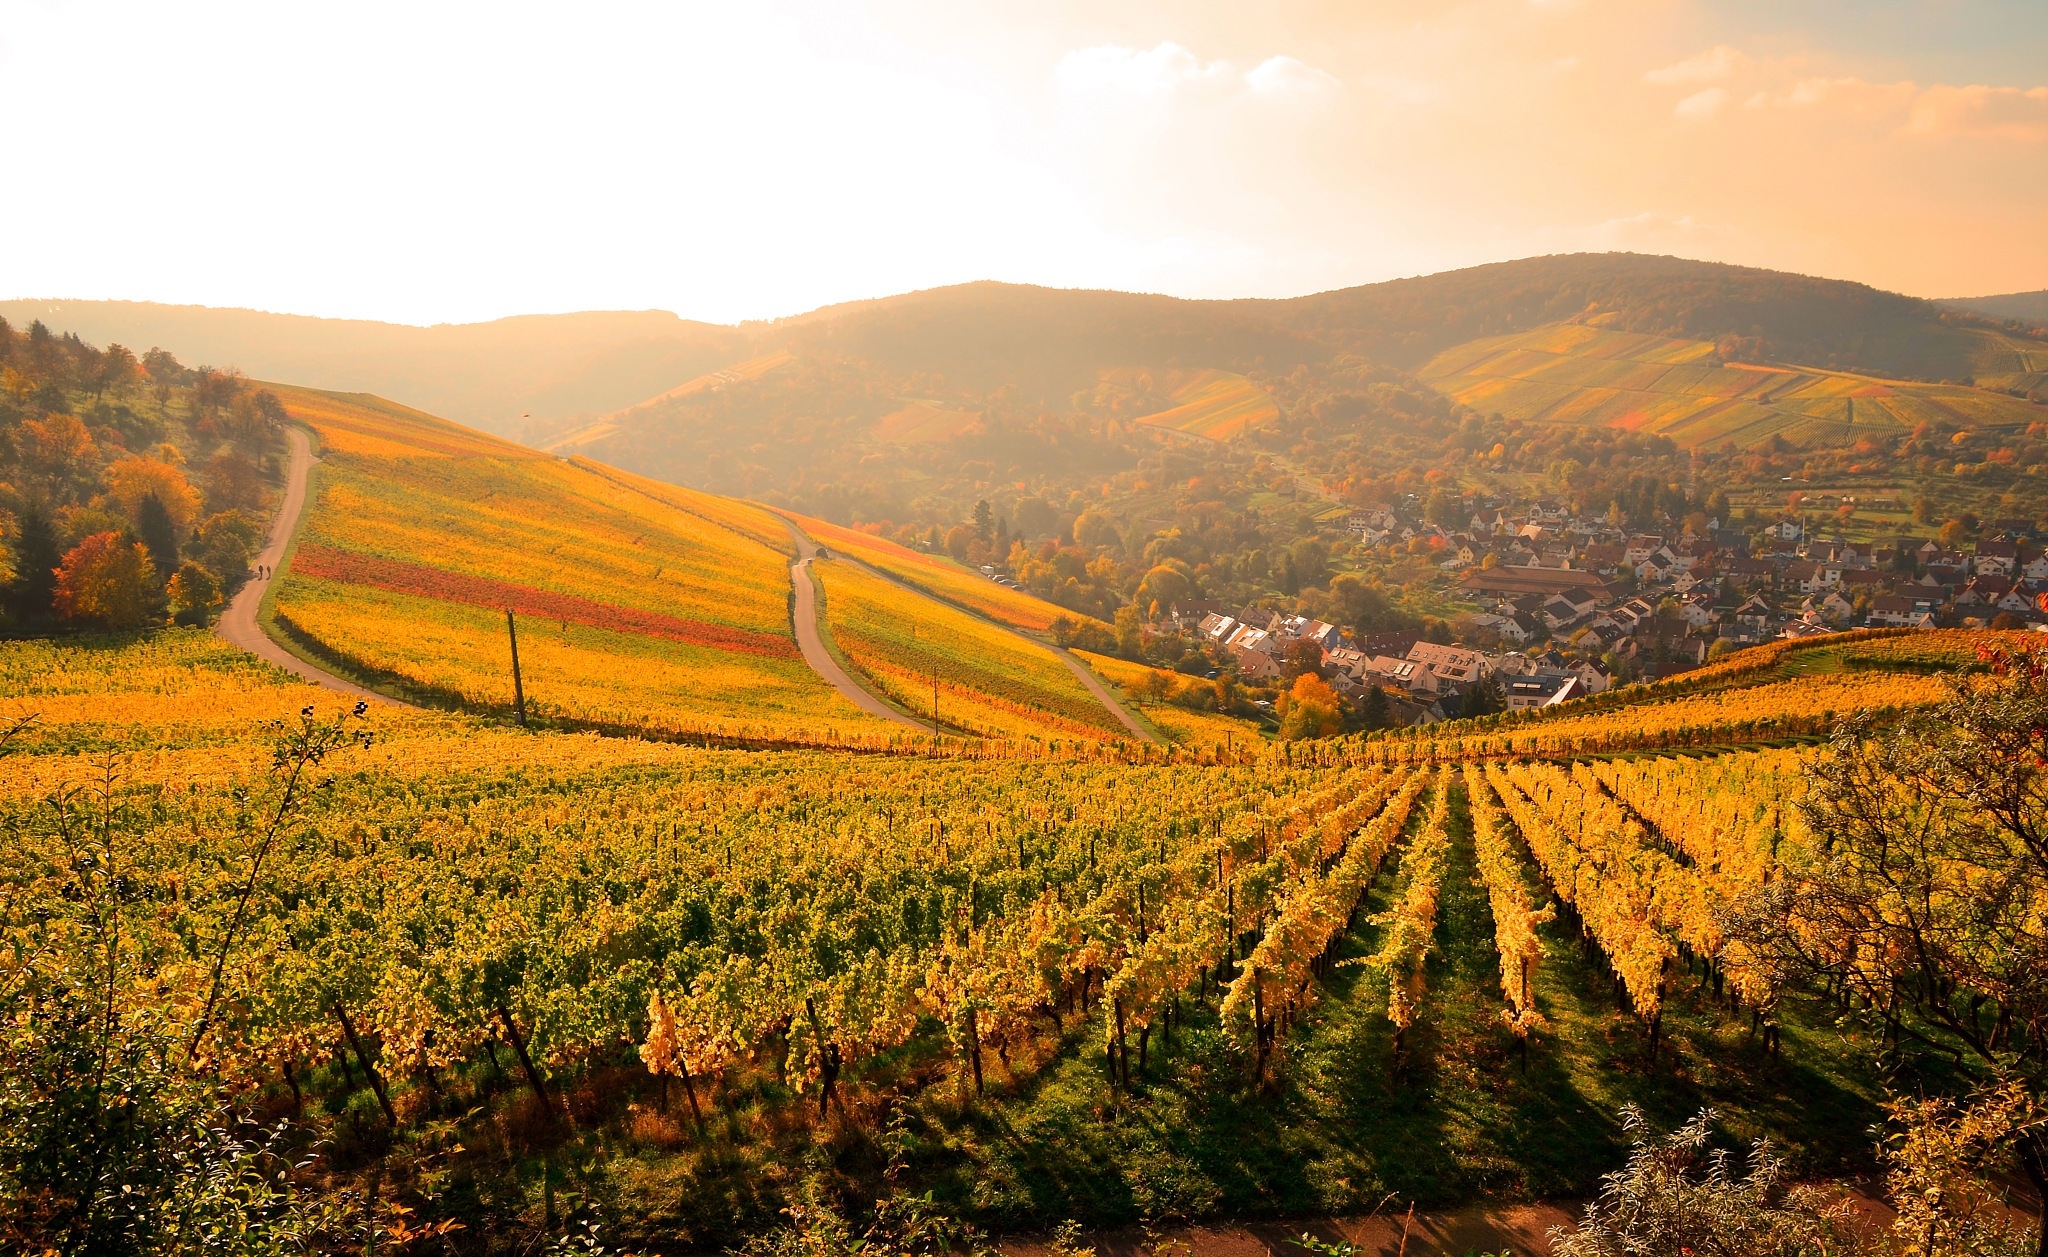 Autumn sunlight by Stoica Emilian